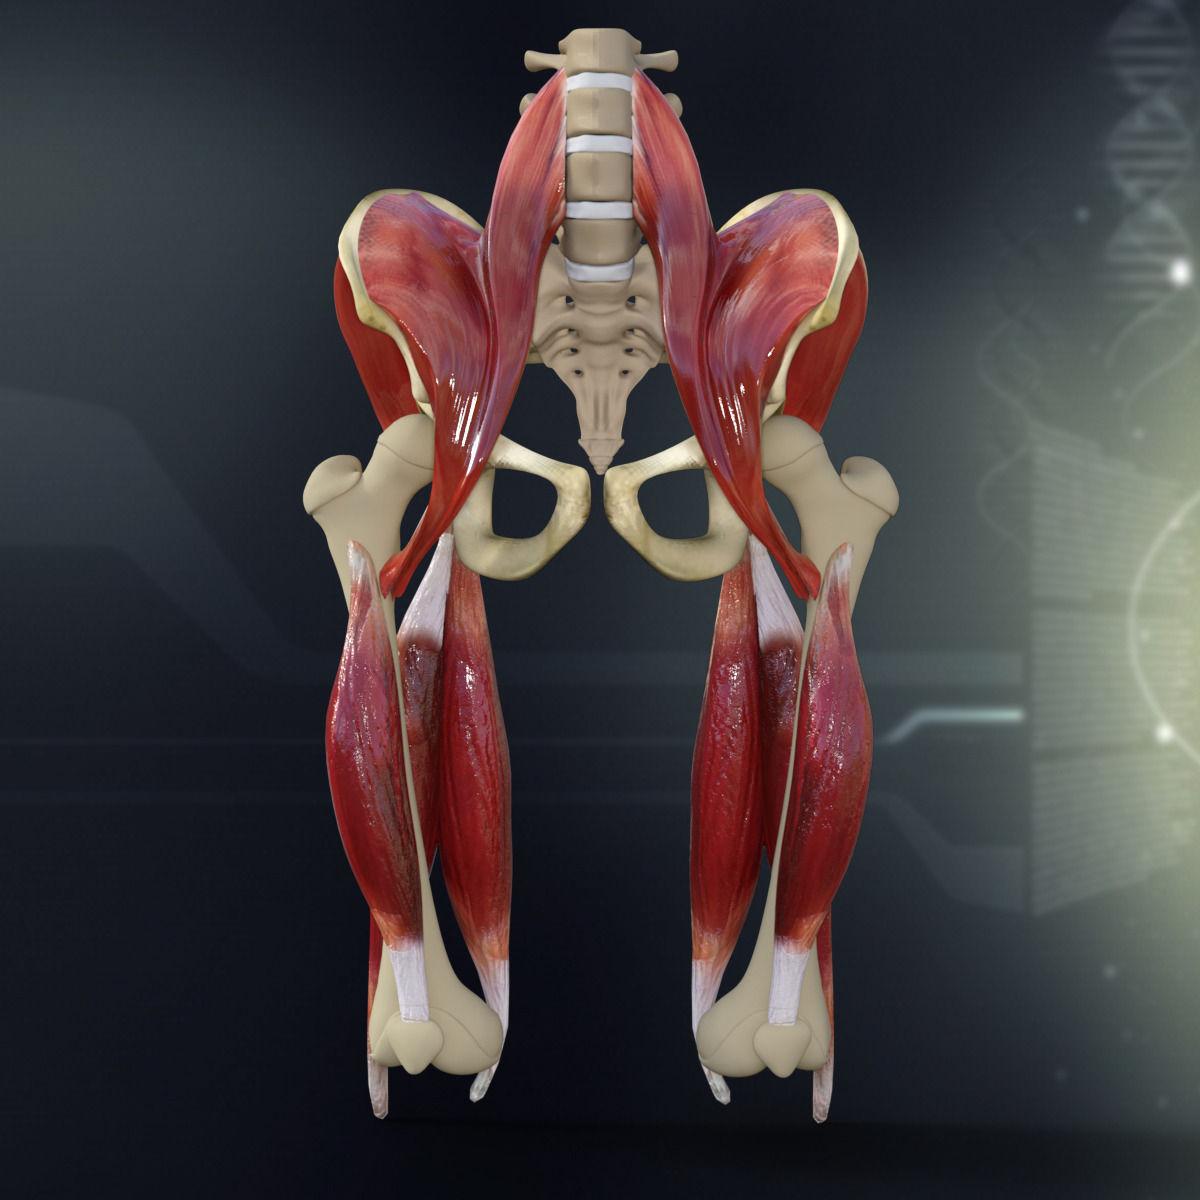 human pelvis muscle bone anatomy 3d model max obj 3ds fbx c4d lwo, Muscles